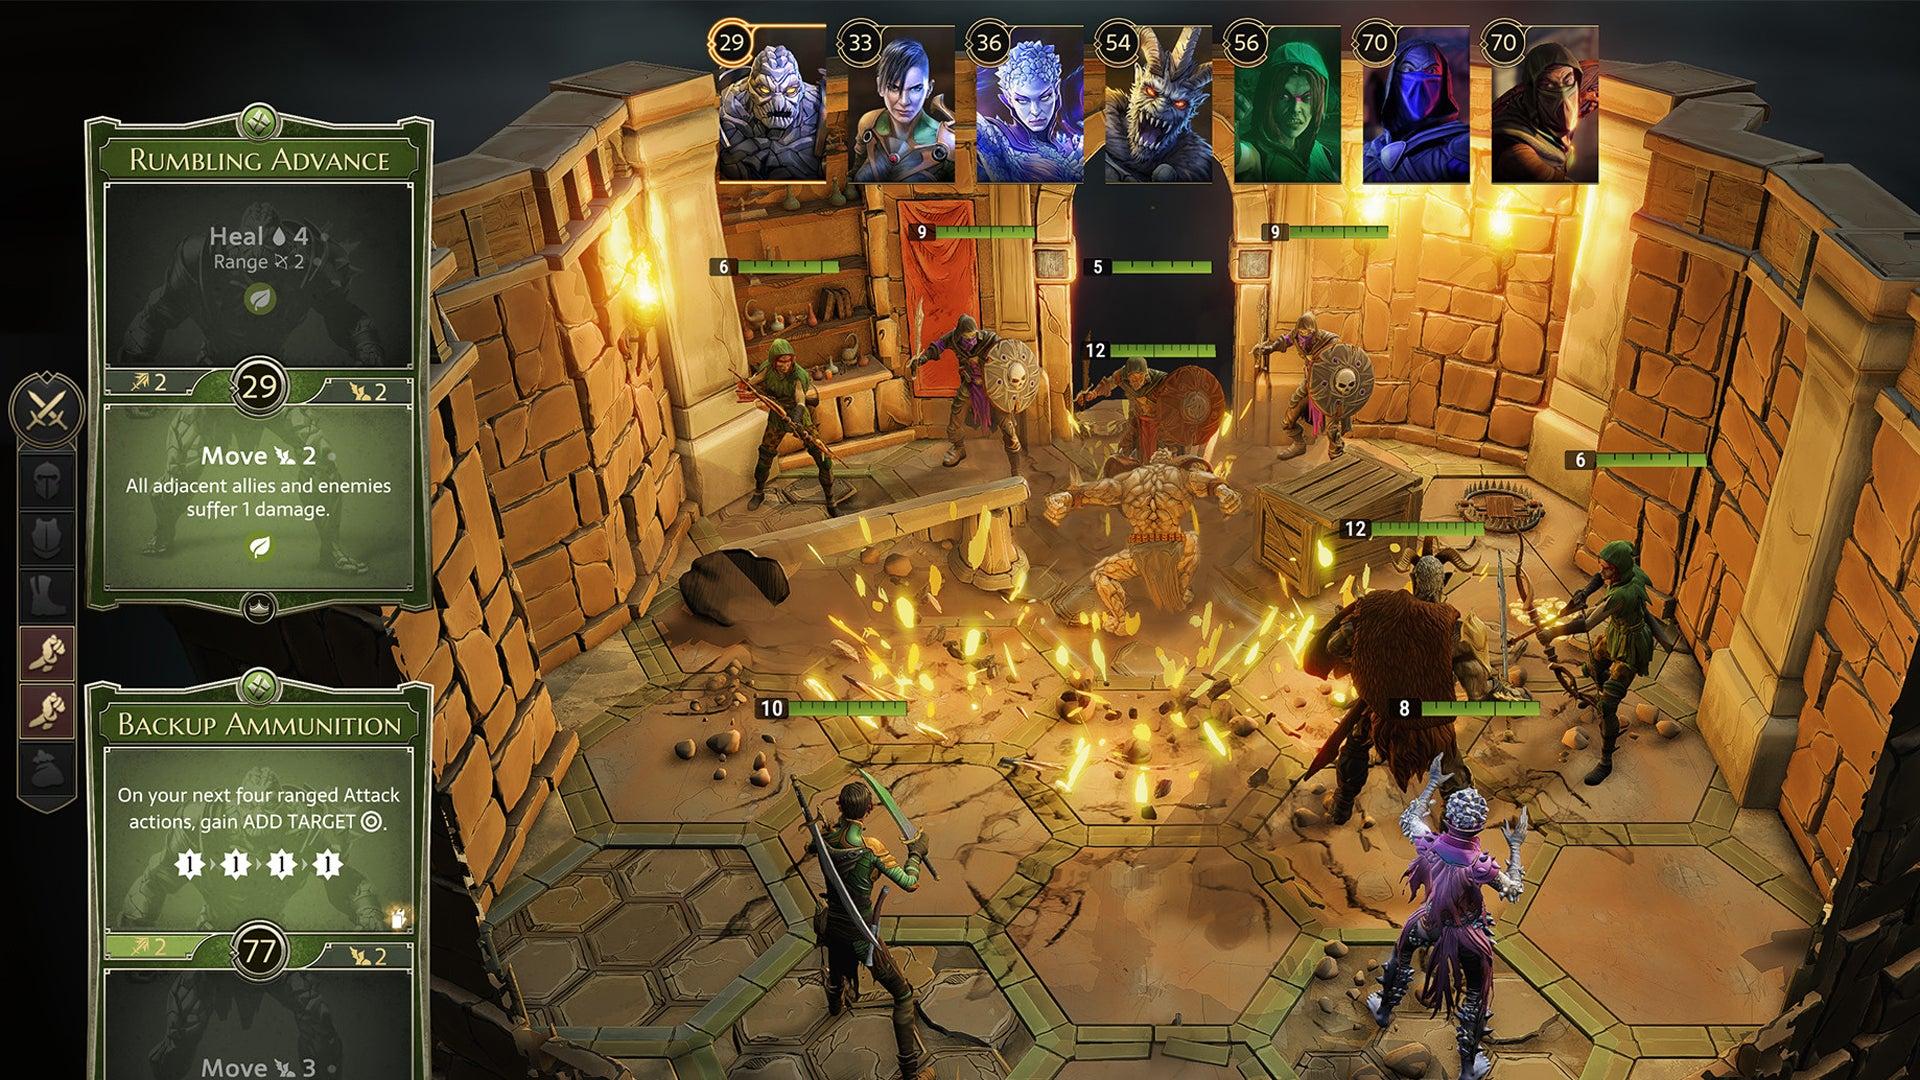 Gloomhaven digital board game screenshot